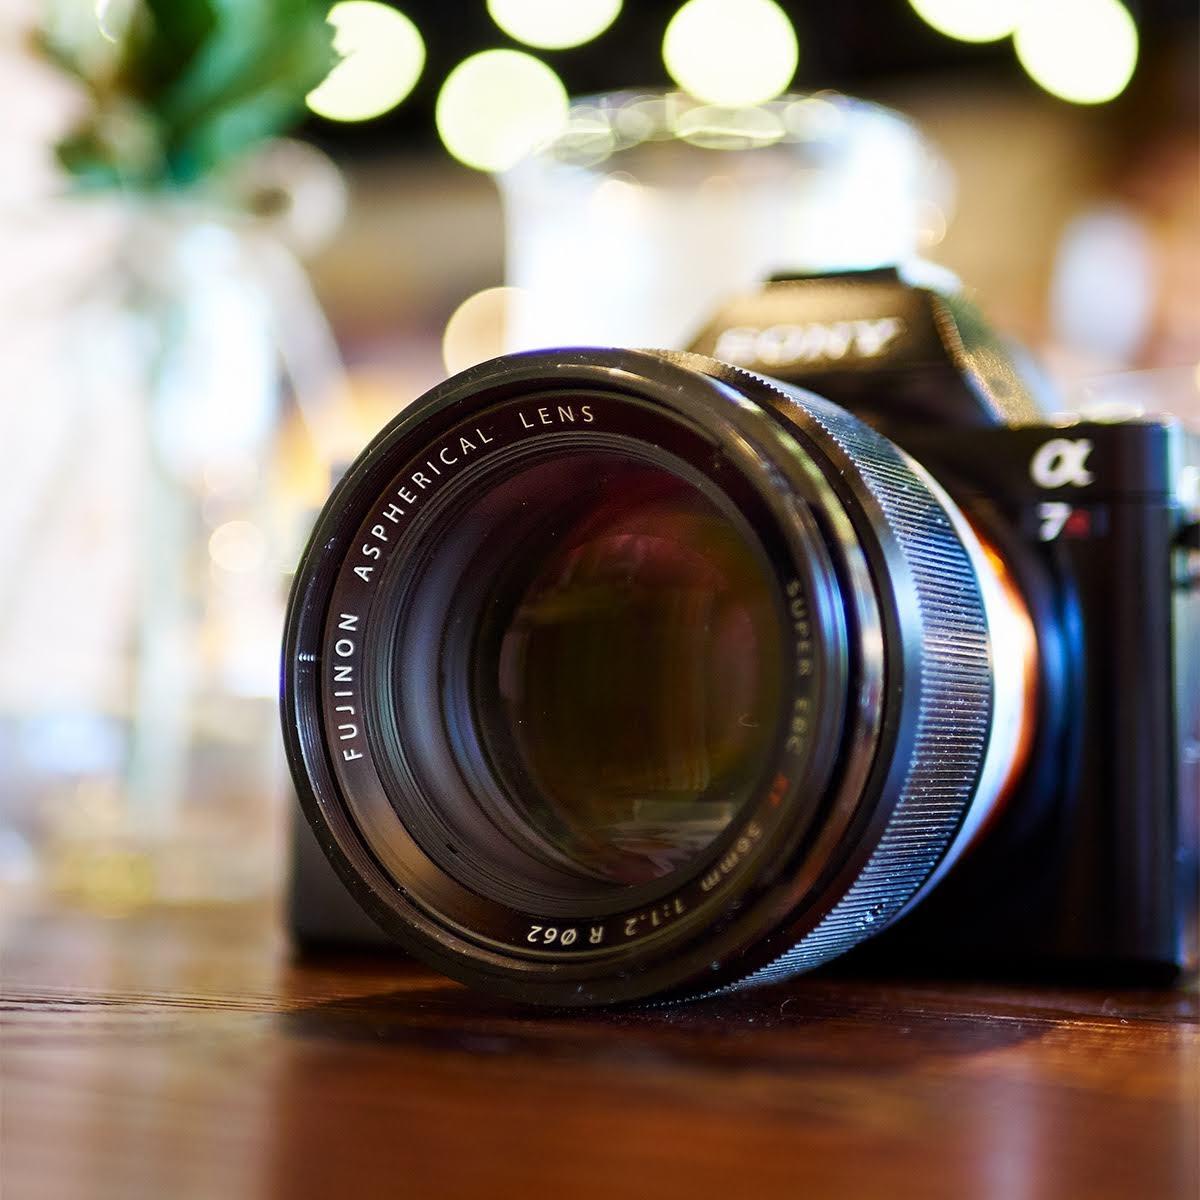 Объектив Fujinon XF 56mm f/1.2 на камере Sony A7R